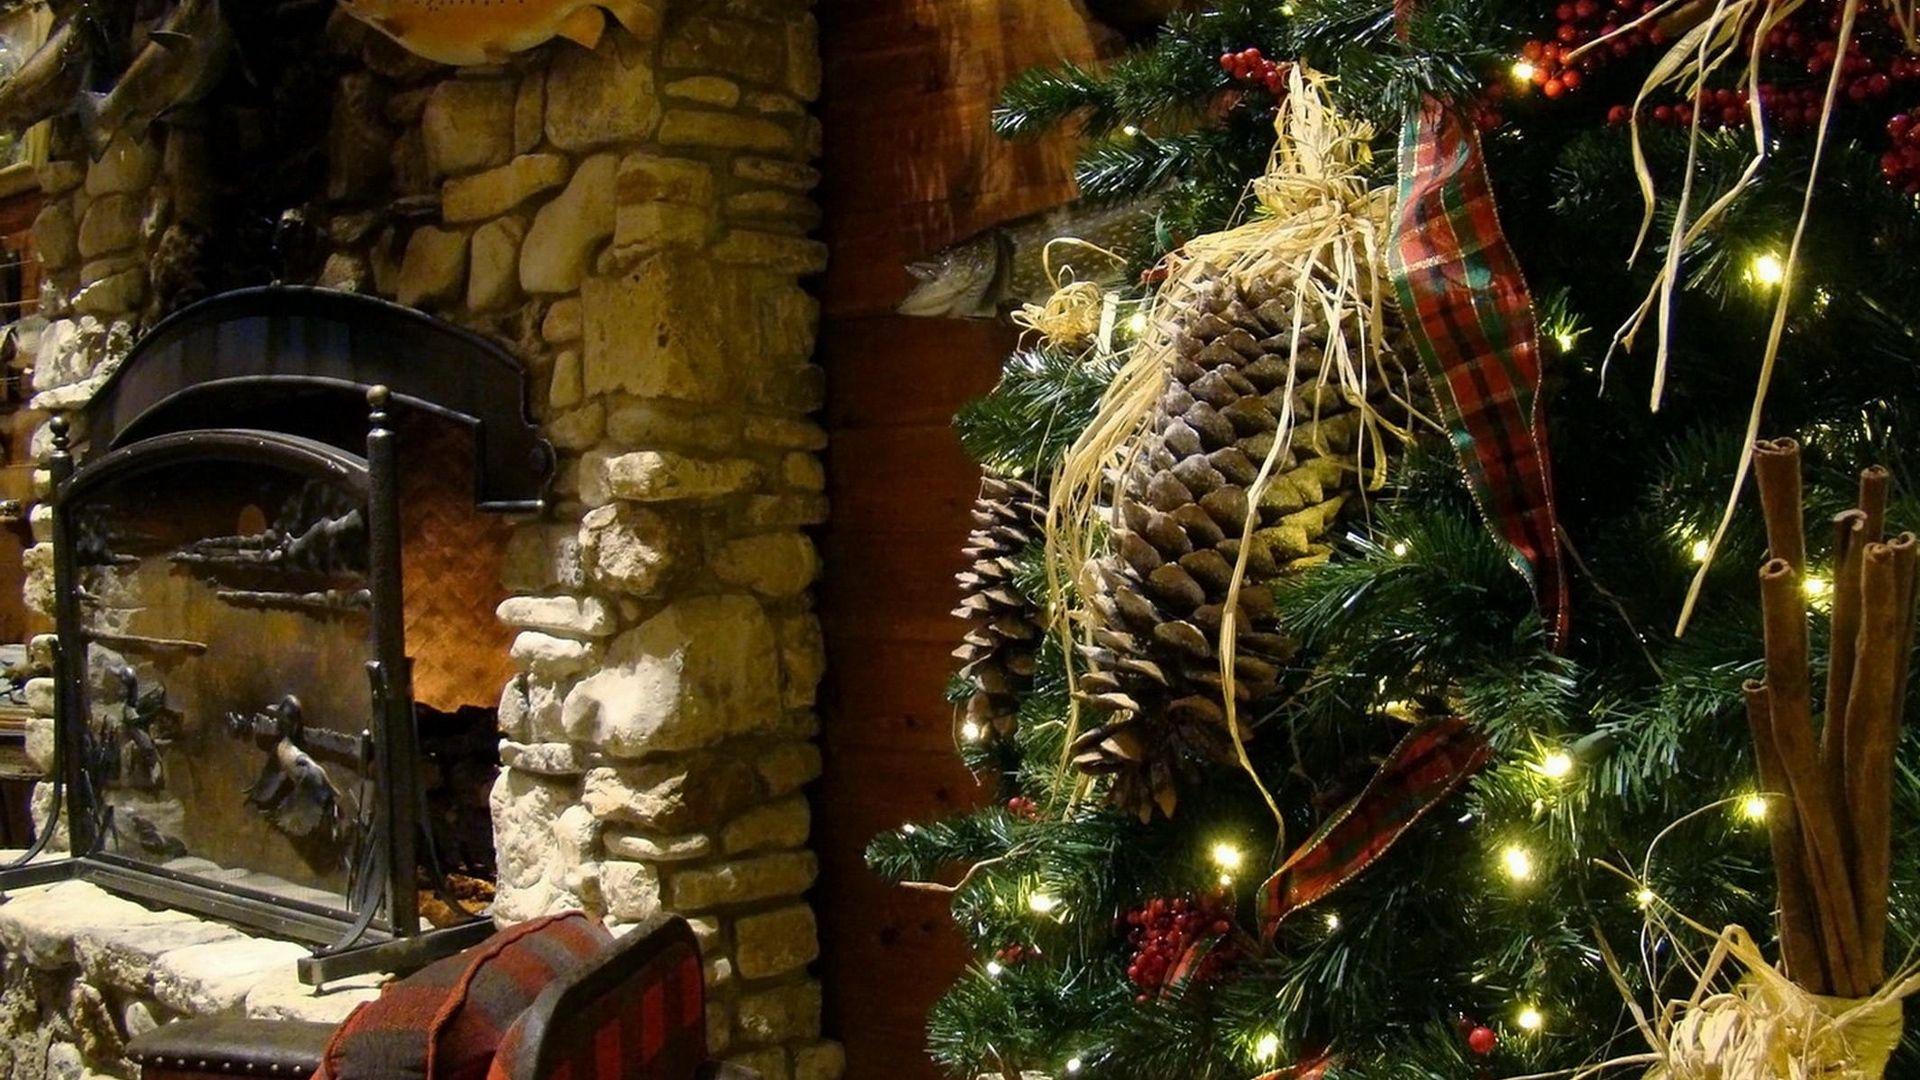 Christmas Fireplace Comfort computer wallpaper